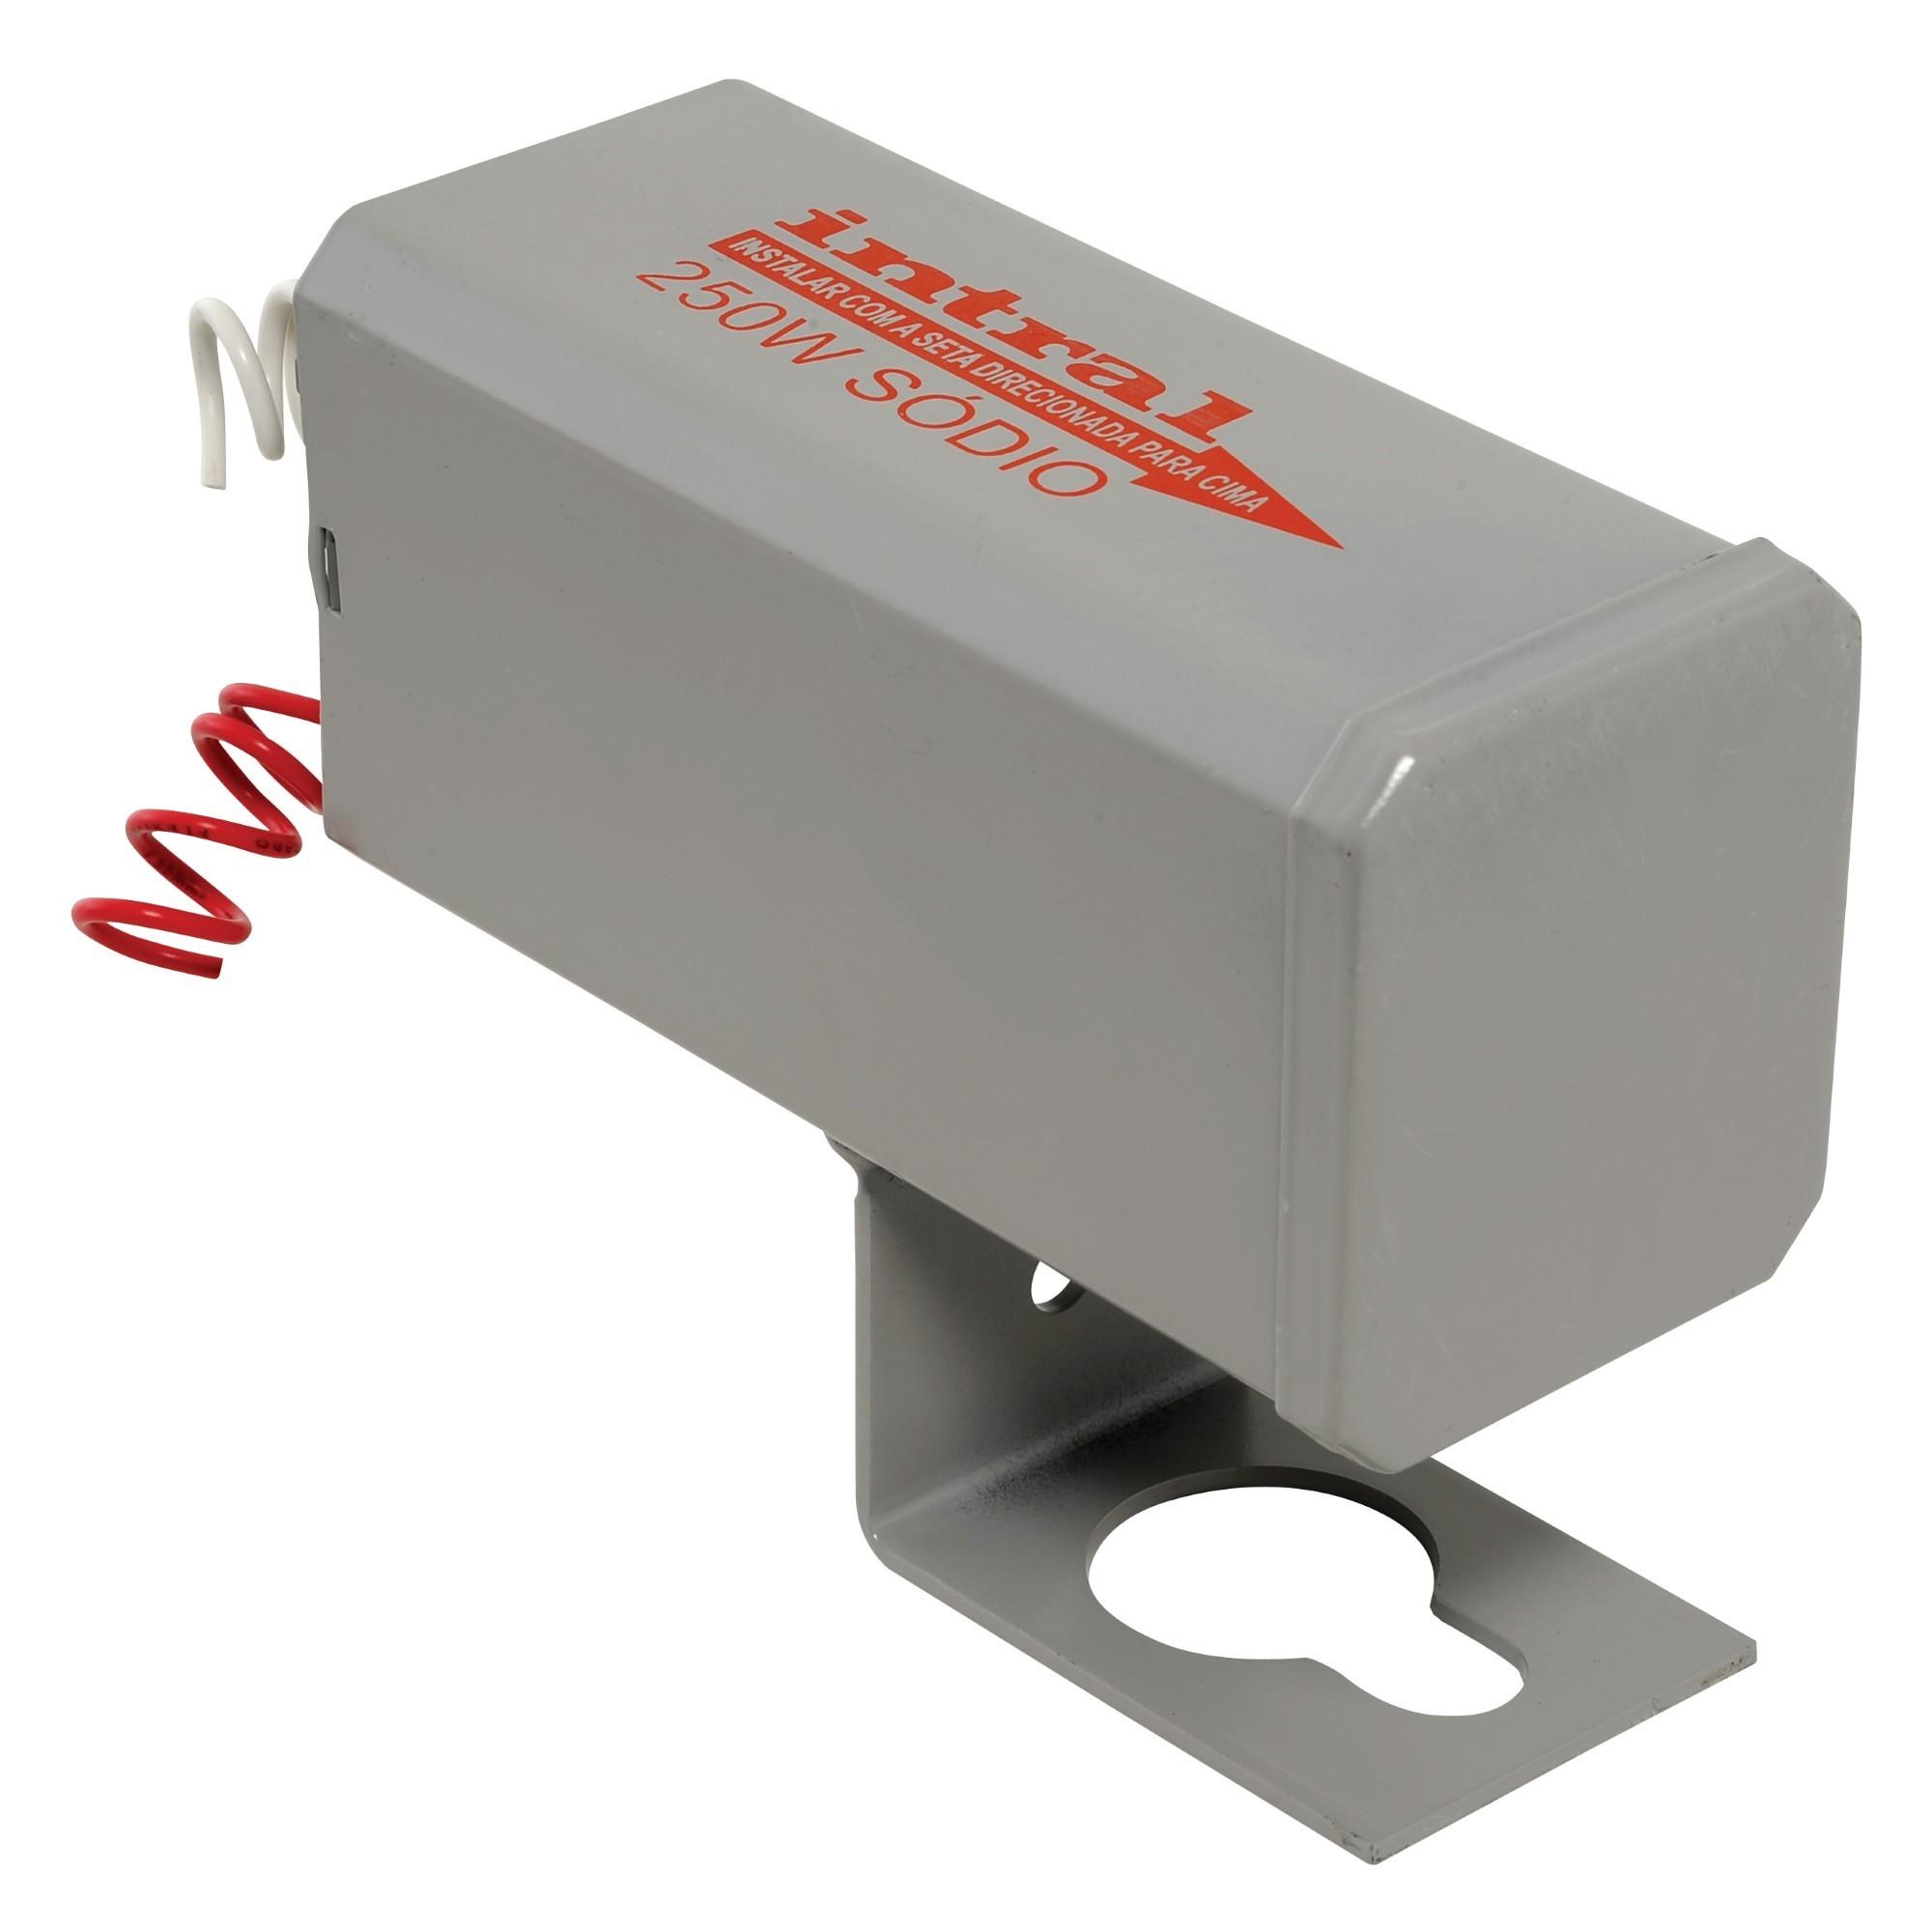 Reator Metalico Vapor 150W Universal 1230 - Intral